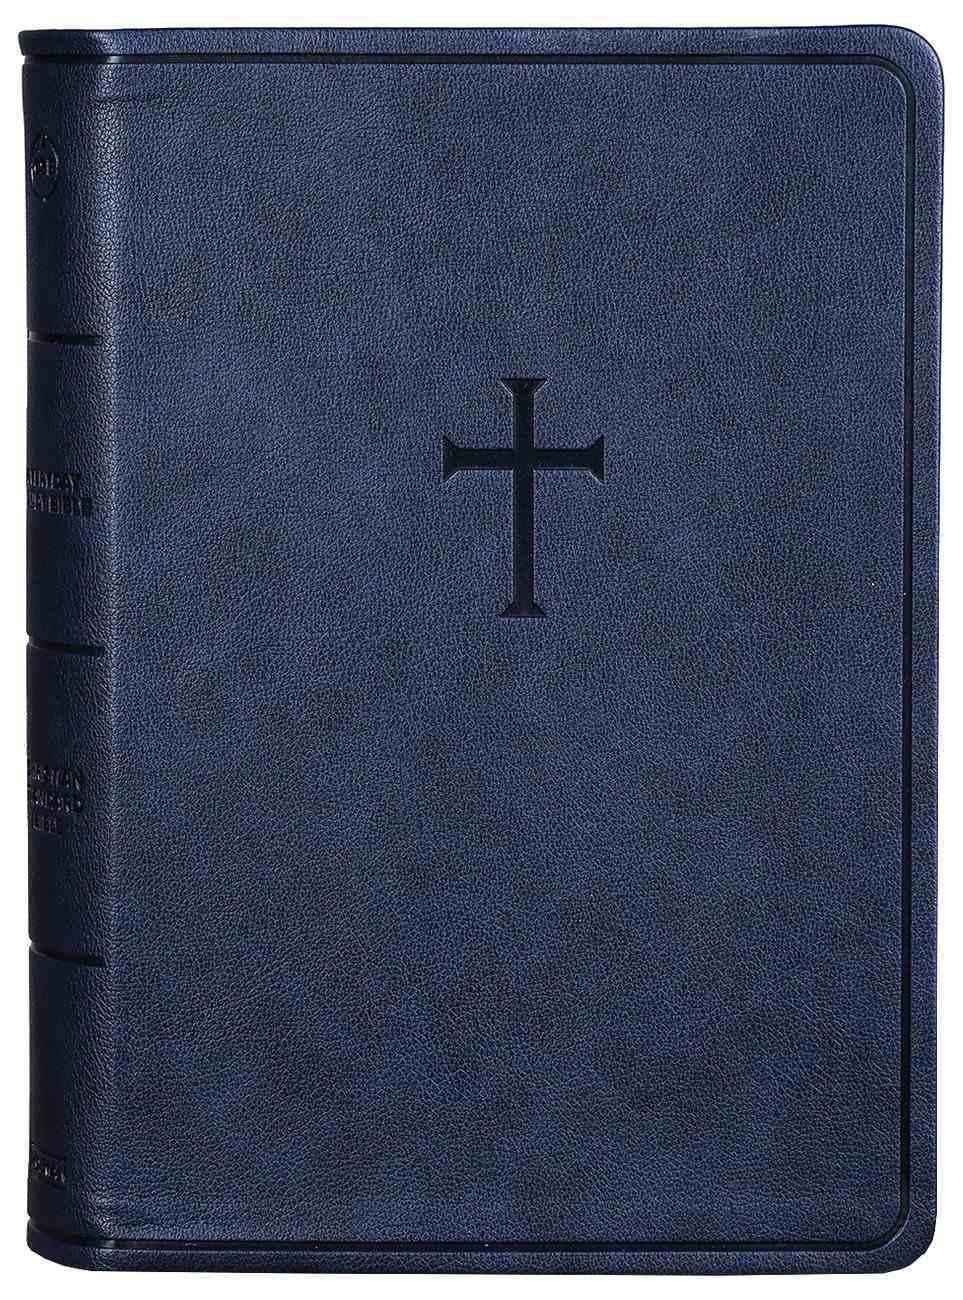 CSB Everyday Study Bible Navy Cross Imitation Leather